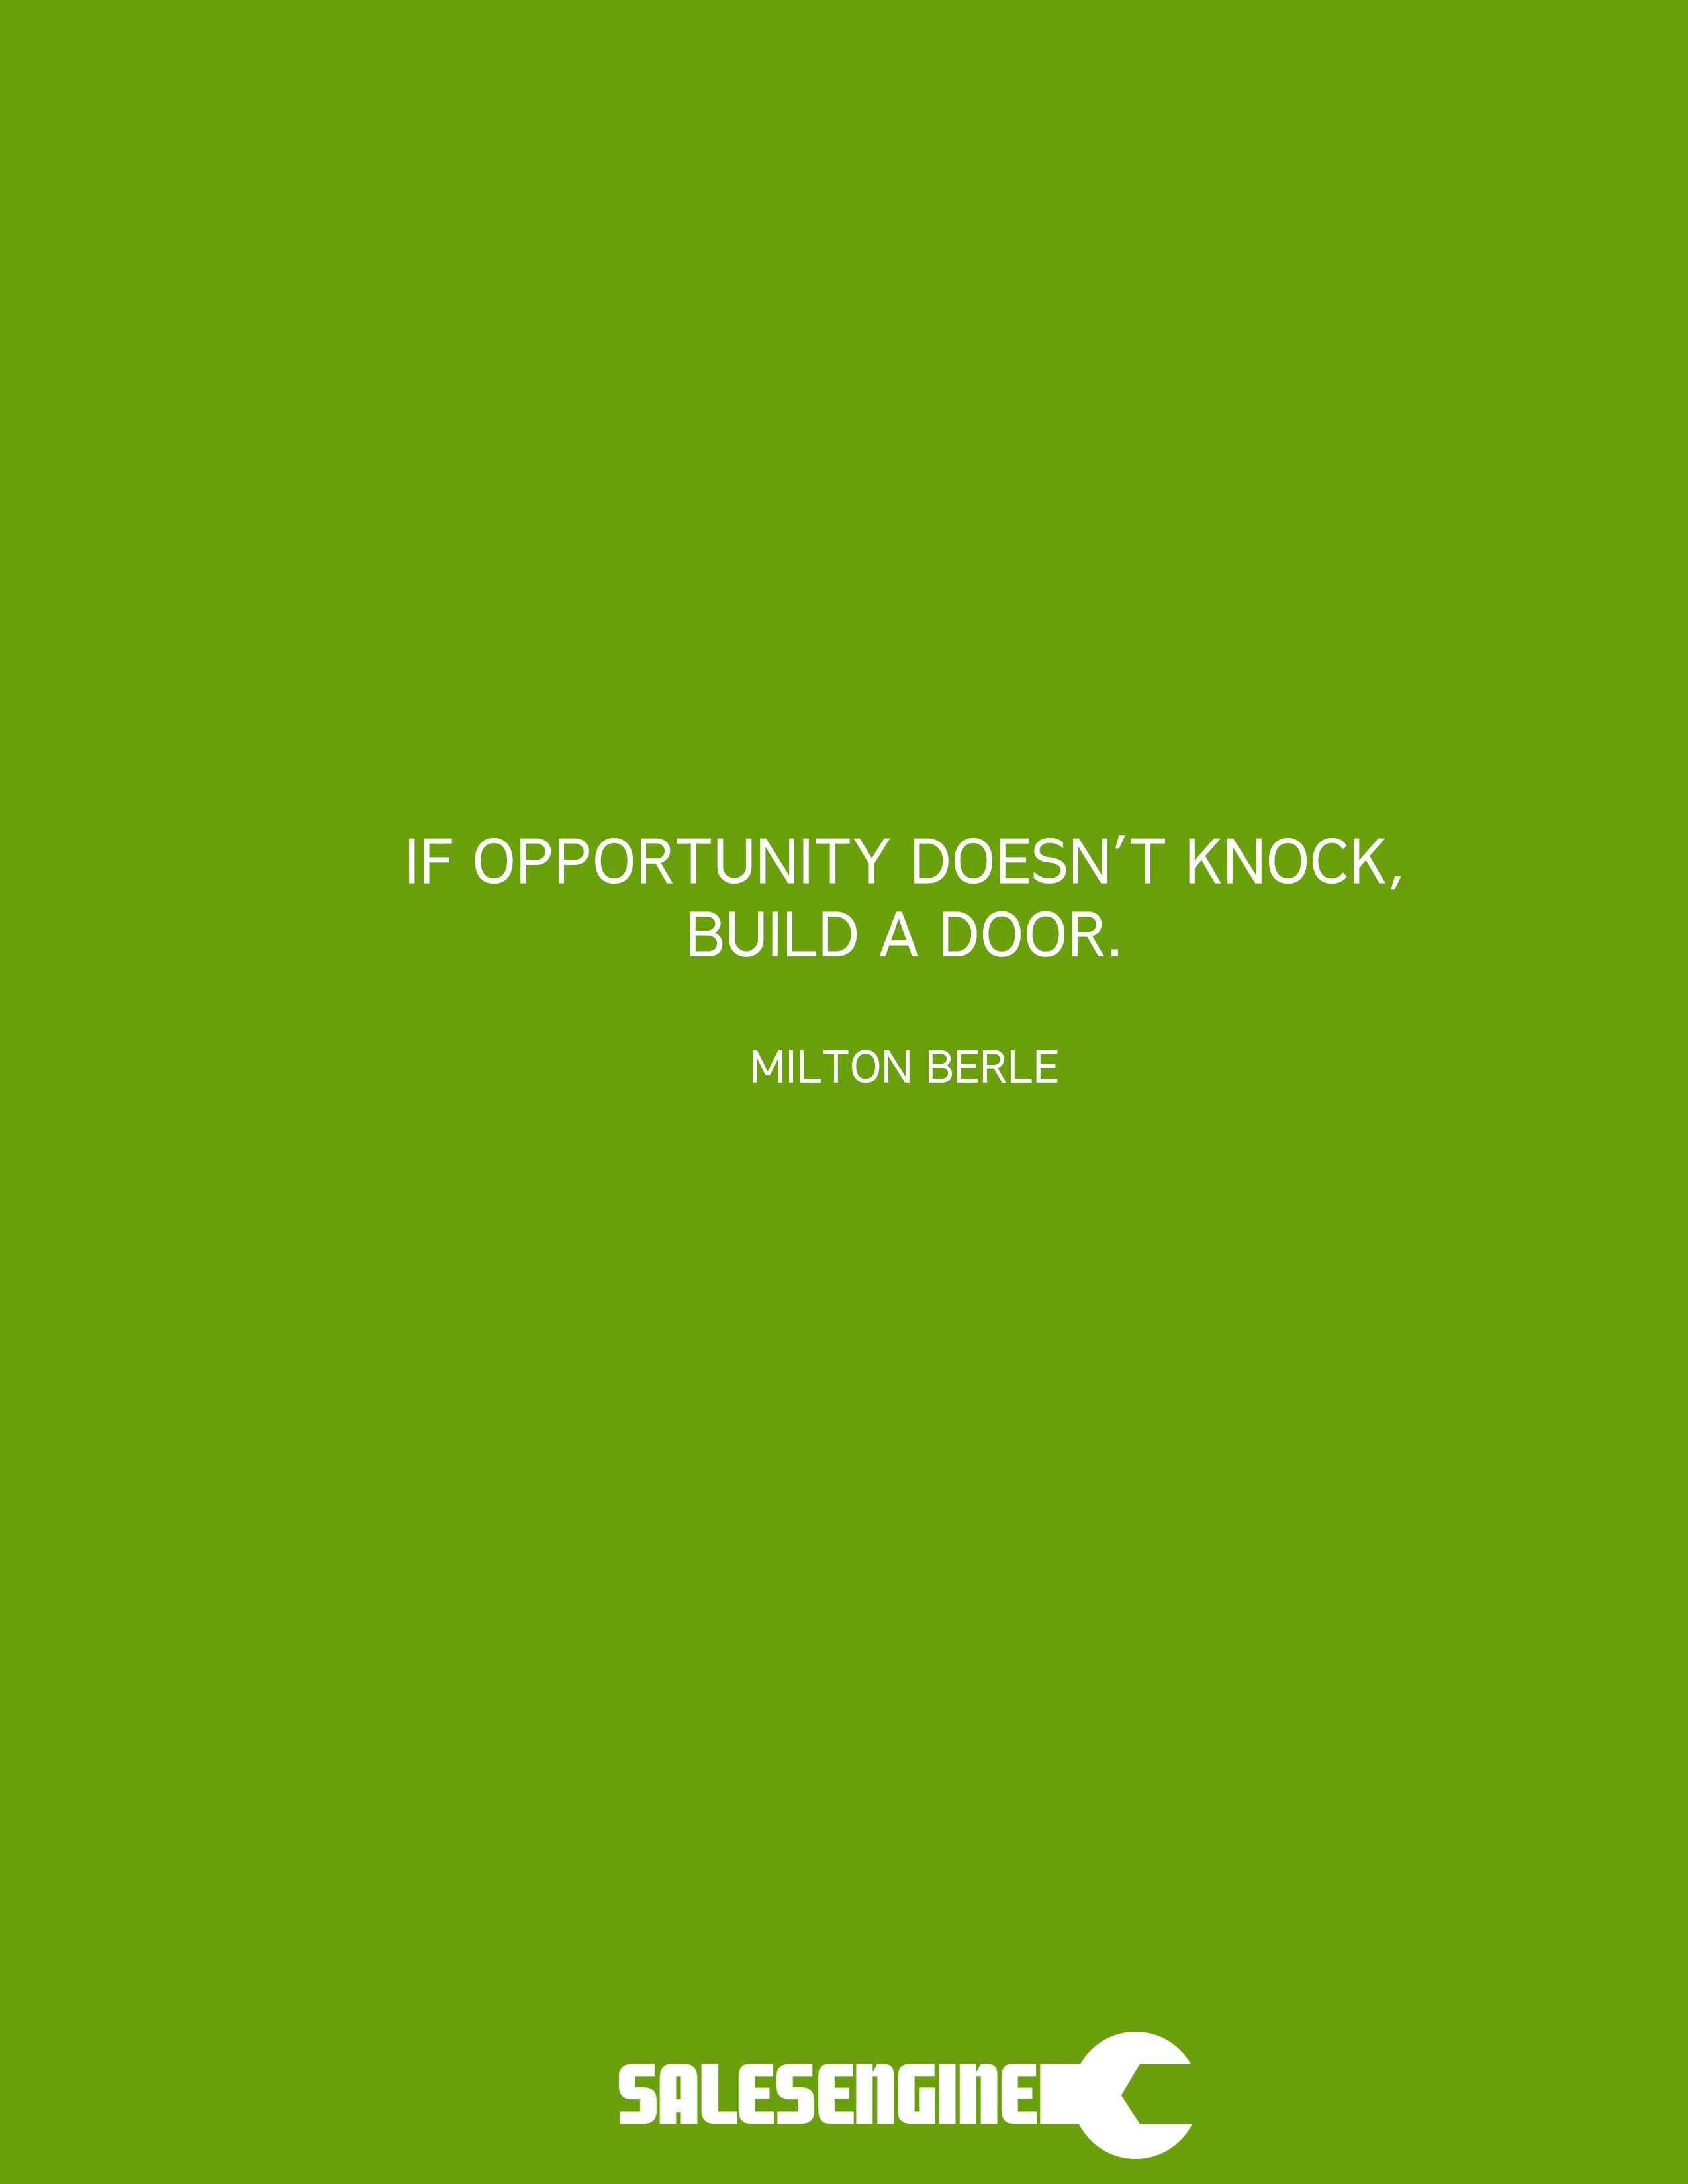 Build A Door Building A Door Sales Quotes Life Motivation